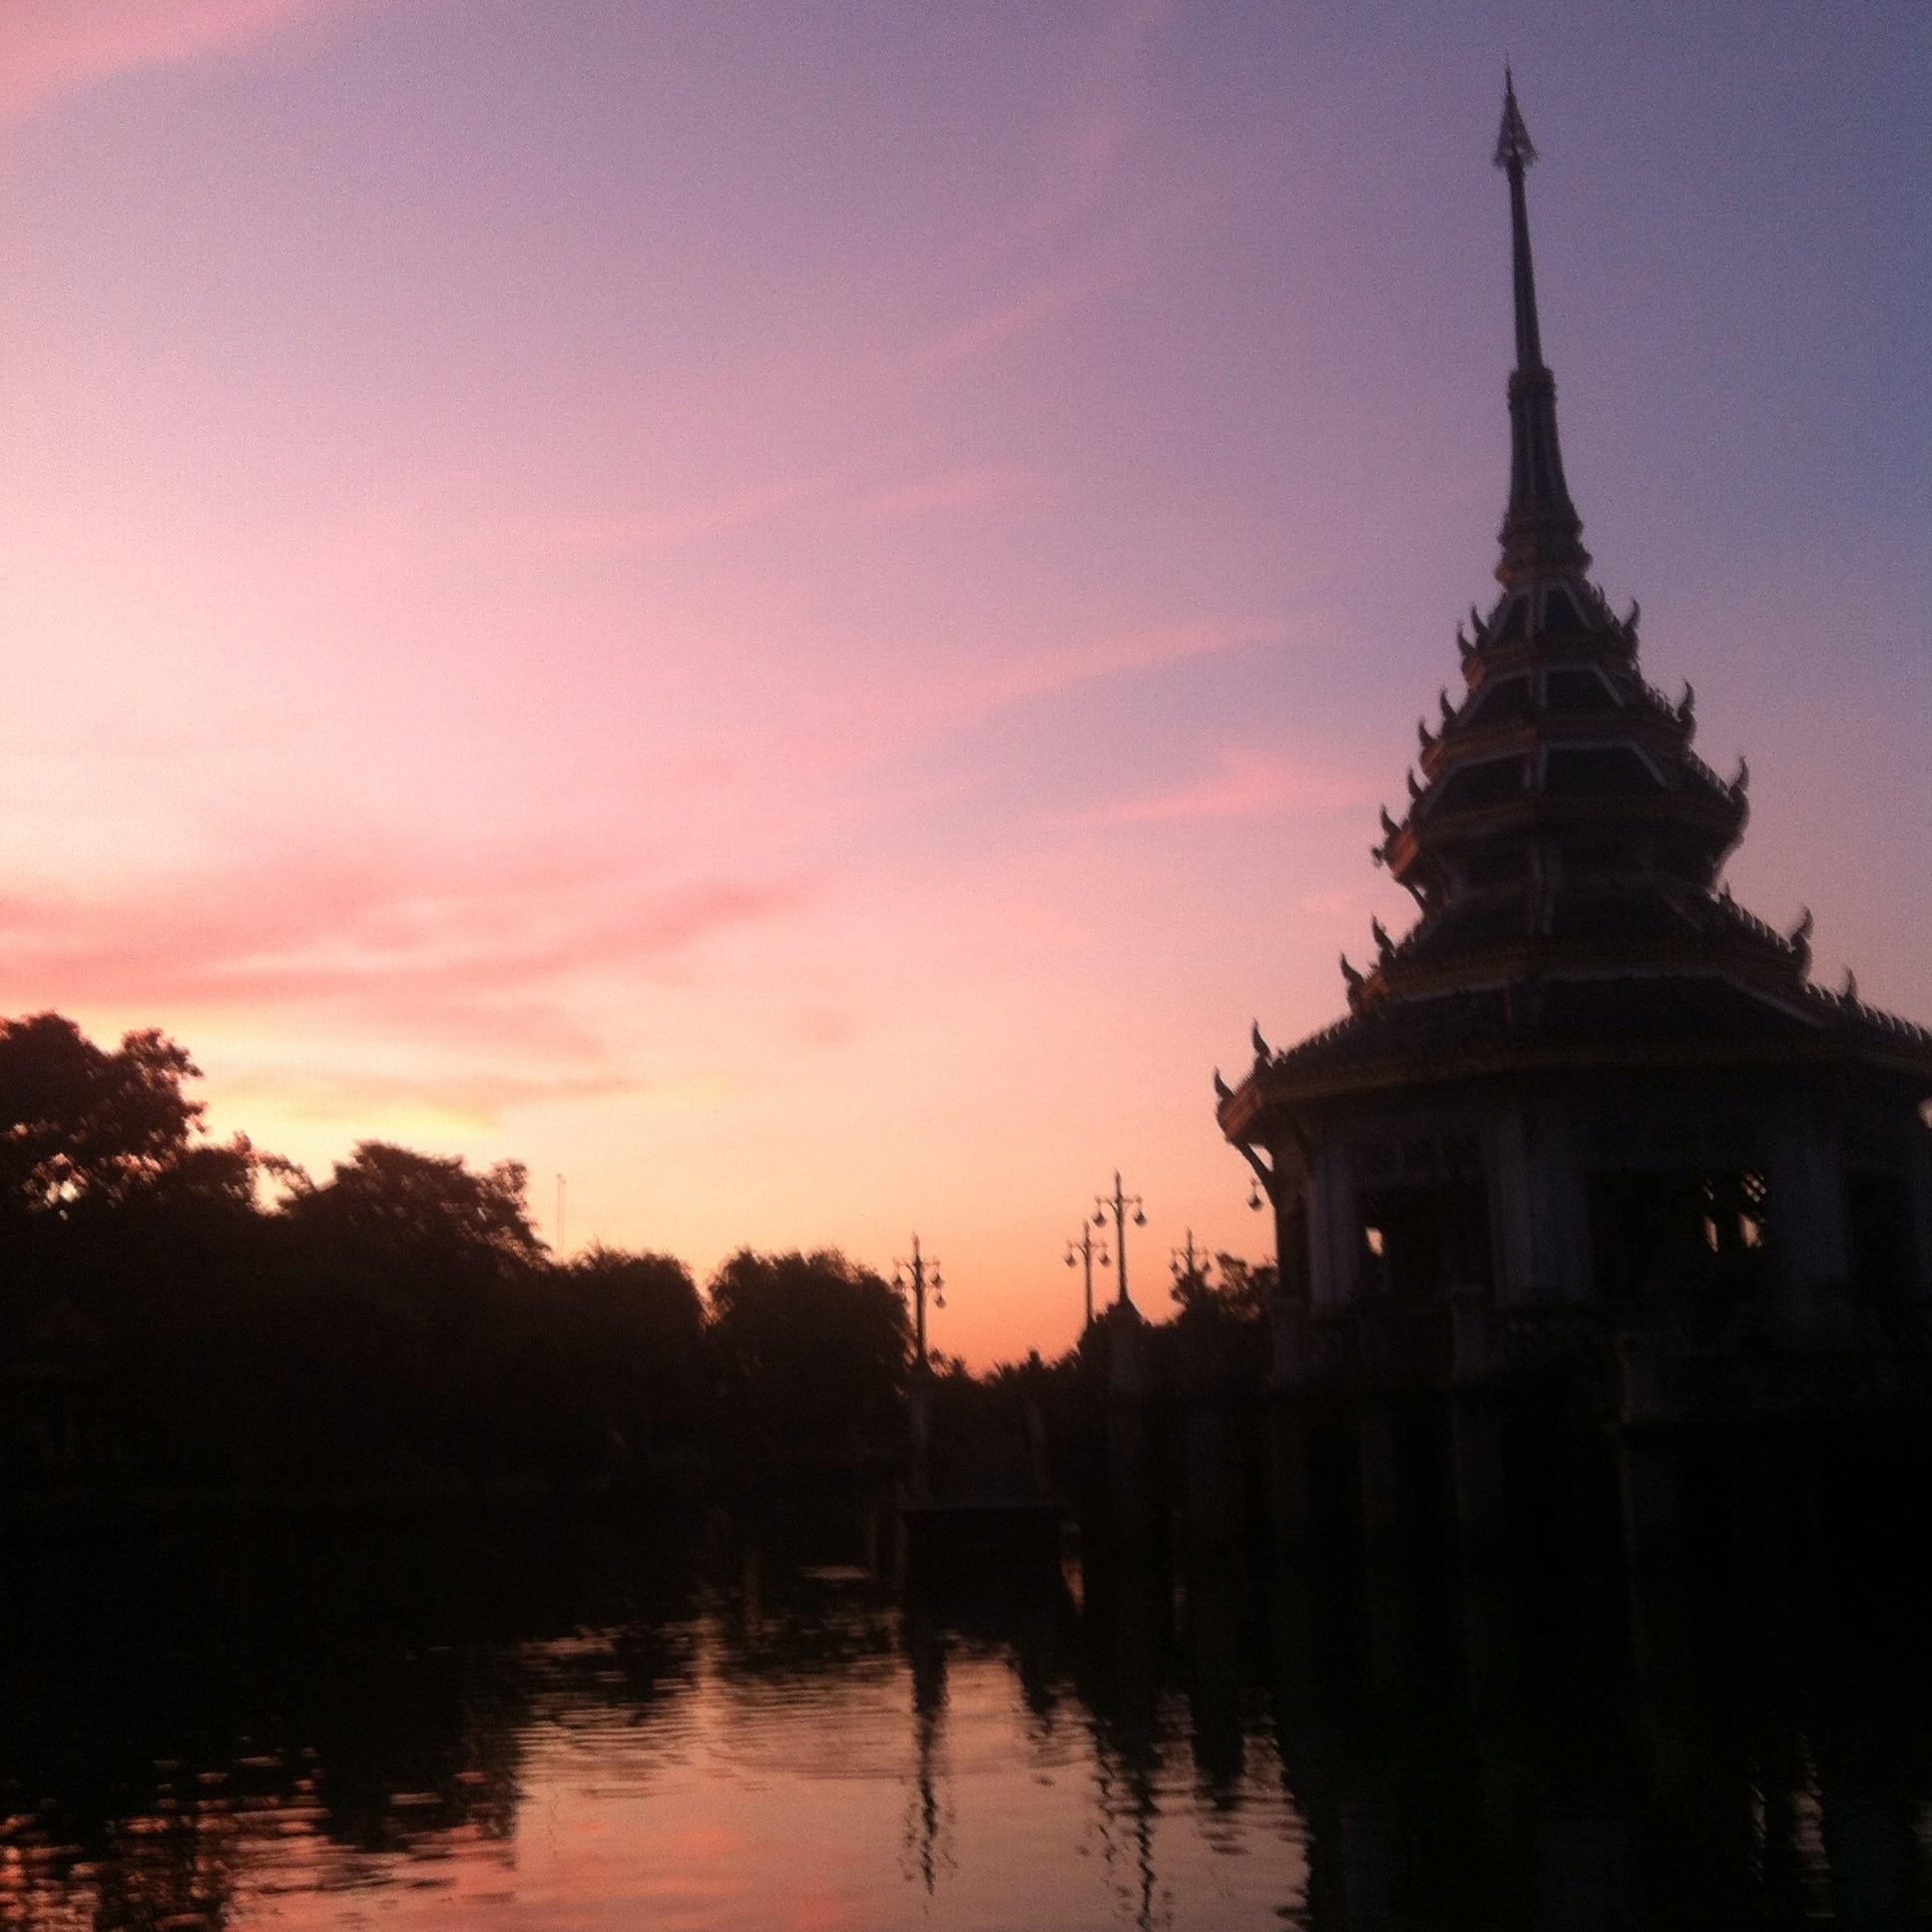 Nonthaburi, Nonthaburi Province, Thailand